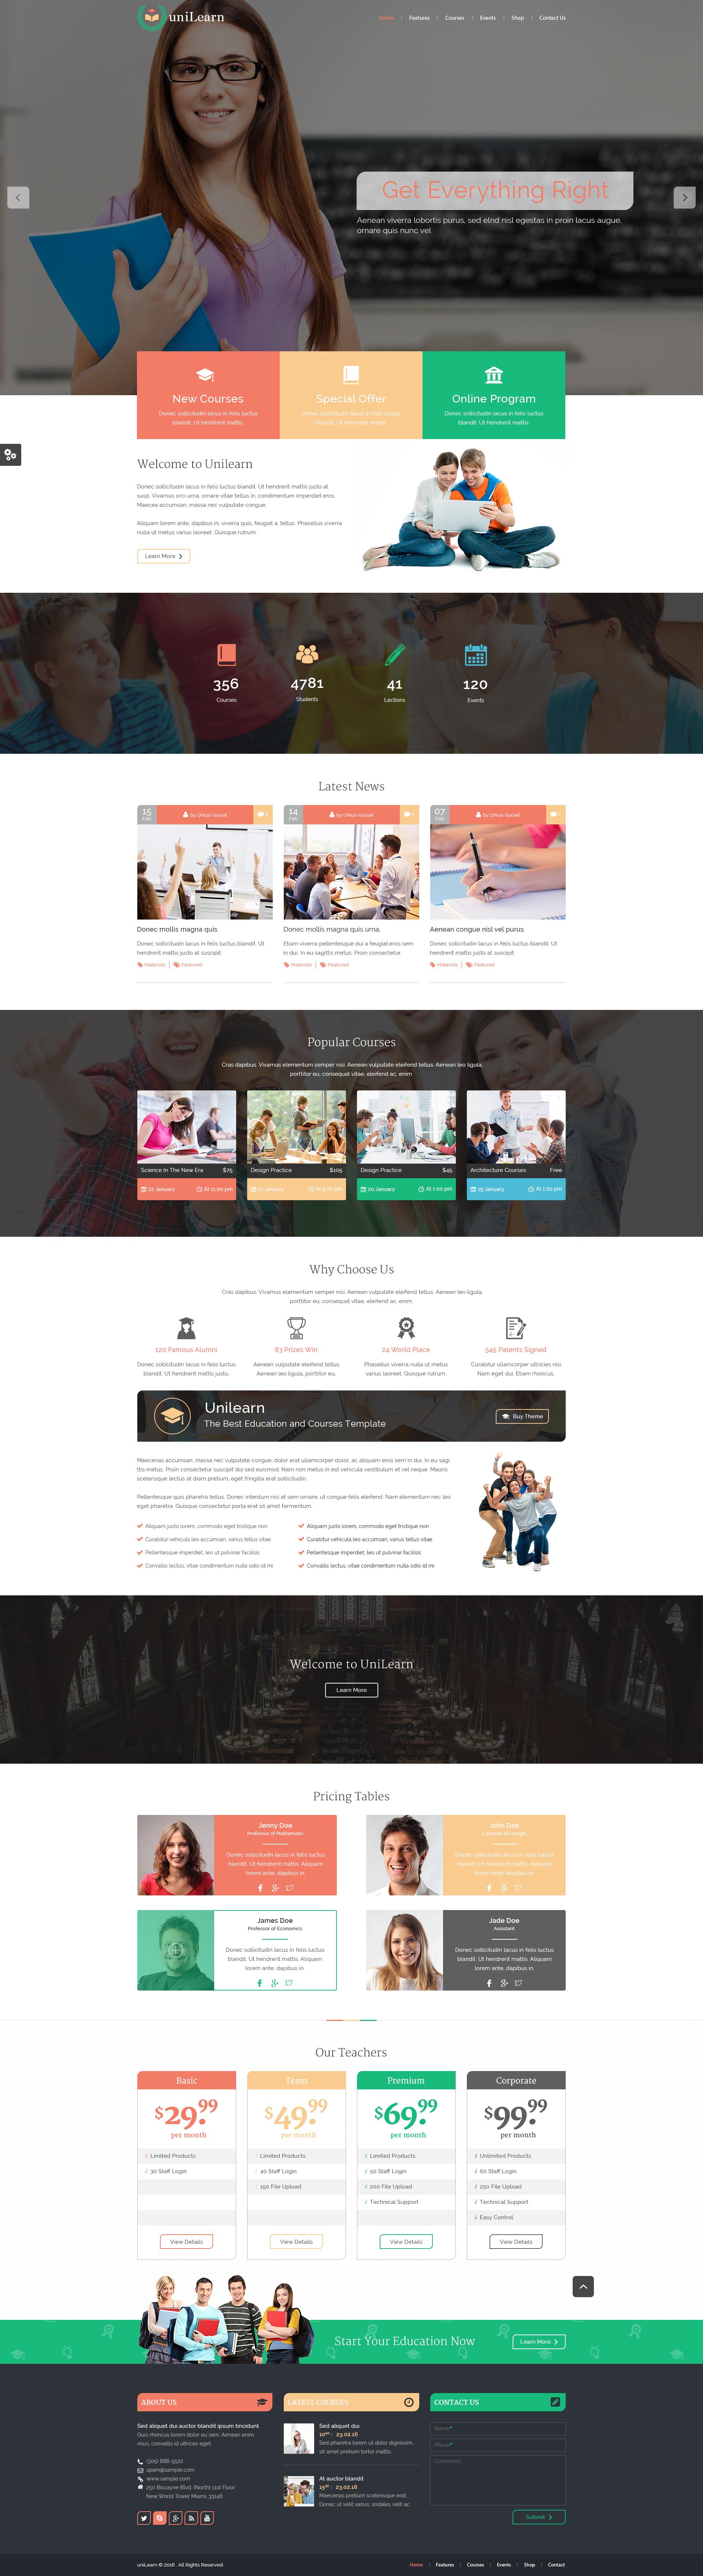 04 home page fullscreen